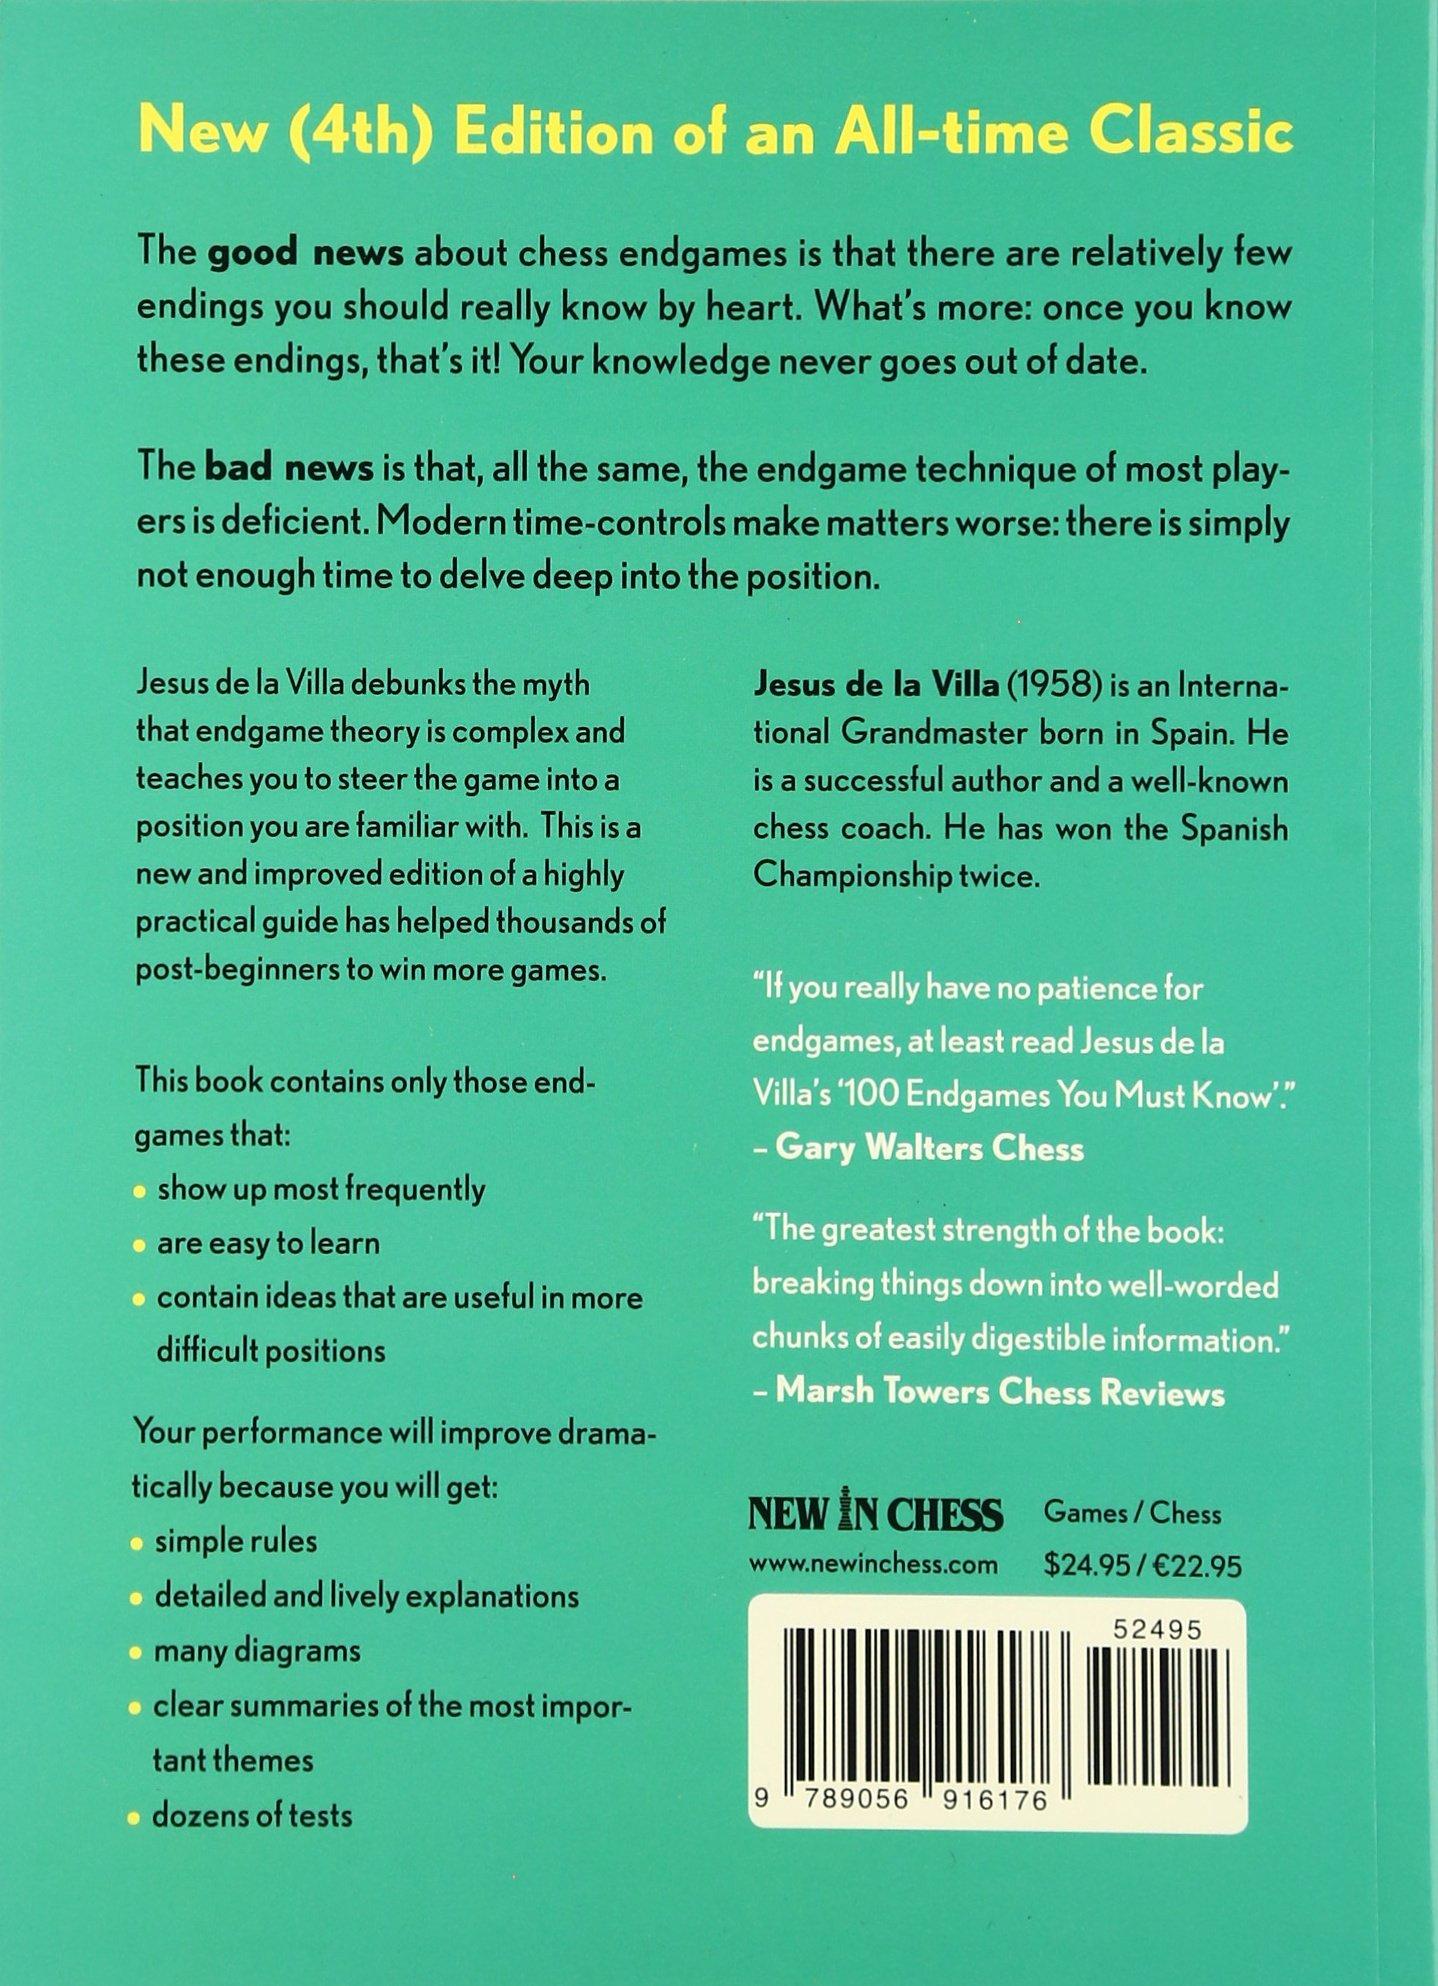 100 Endgames You Must Know: Vital Lessons for Every Chess Player: Jesus de  la Villa: 9789056916176: Amazon.com: Books